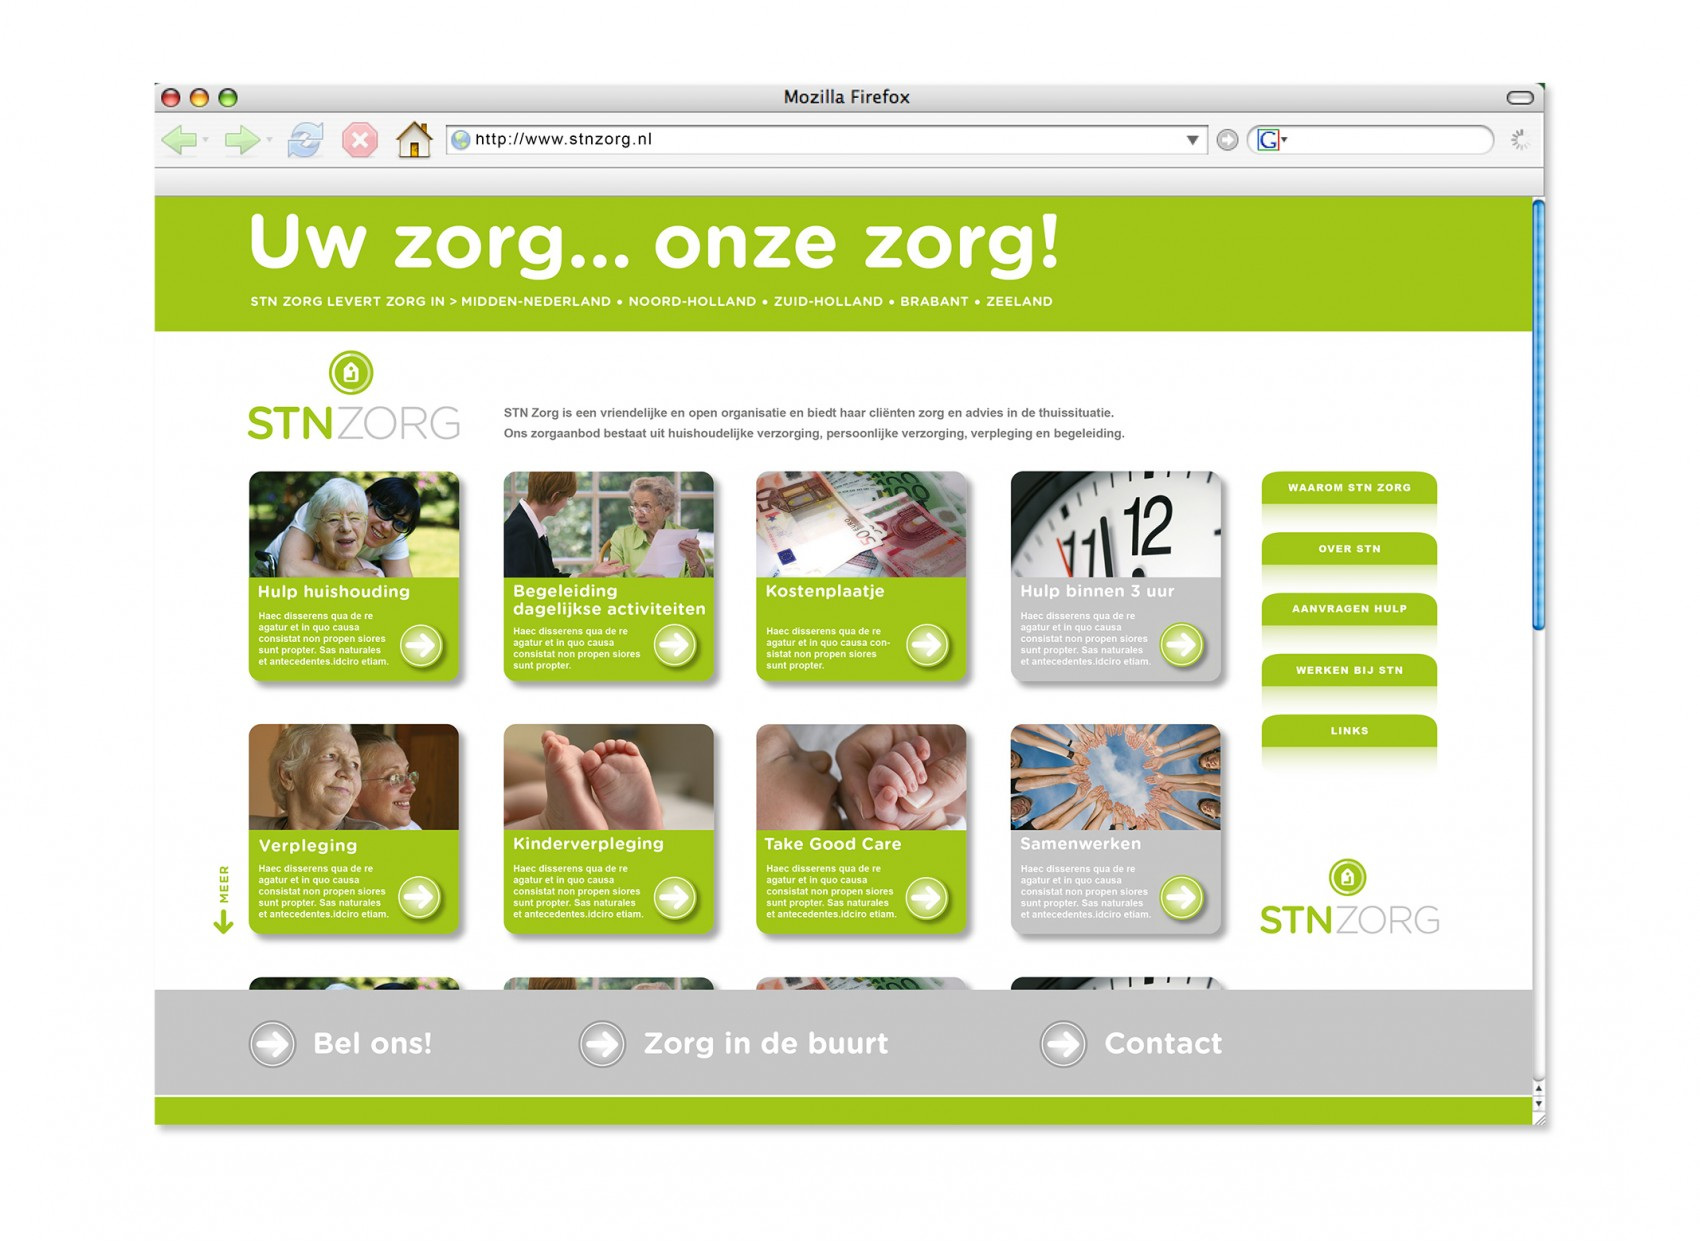 STN Internetsite-Take-Good-Care_1